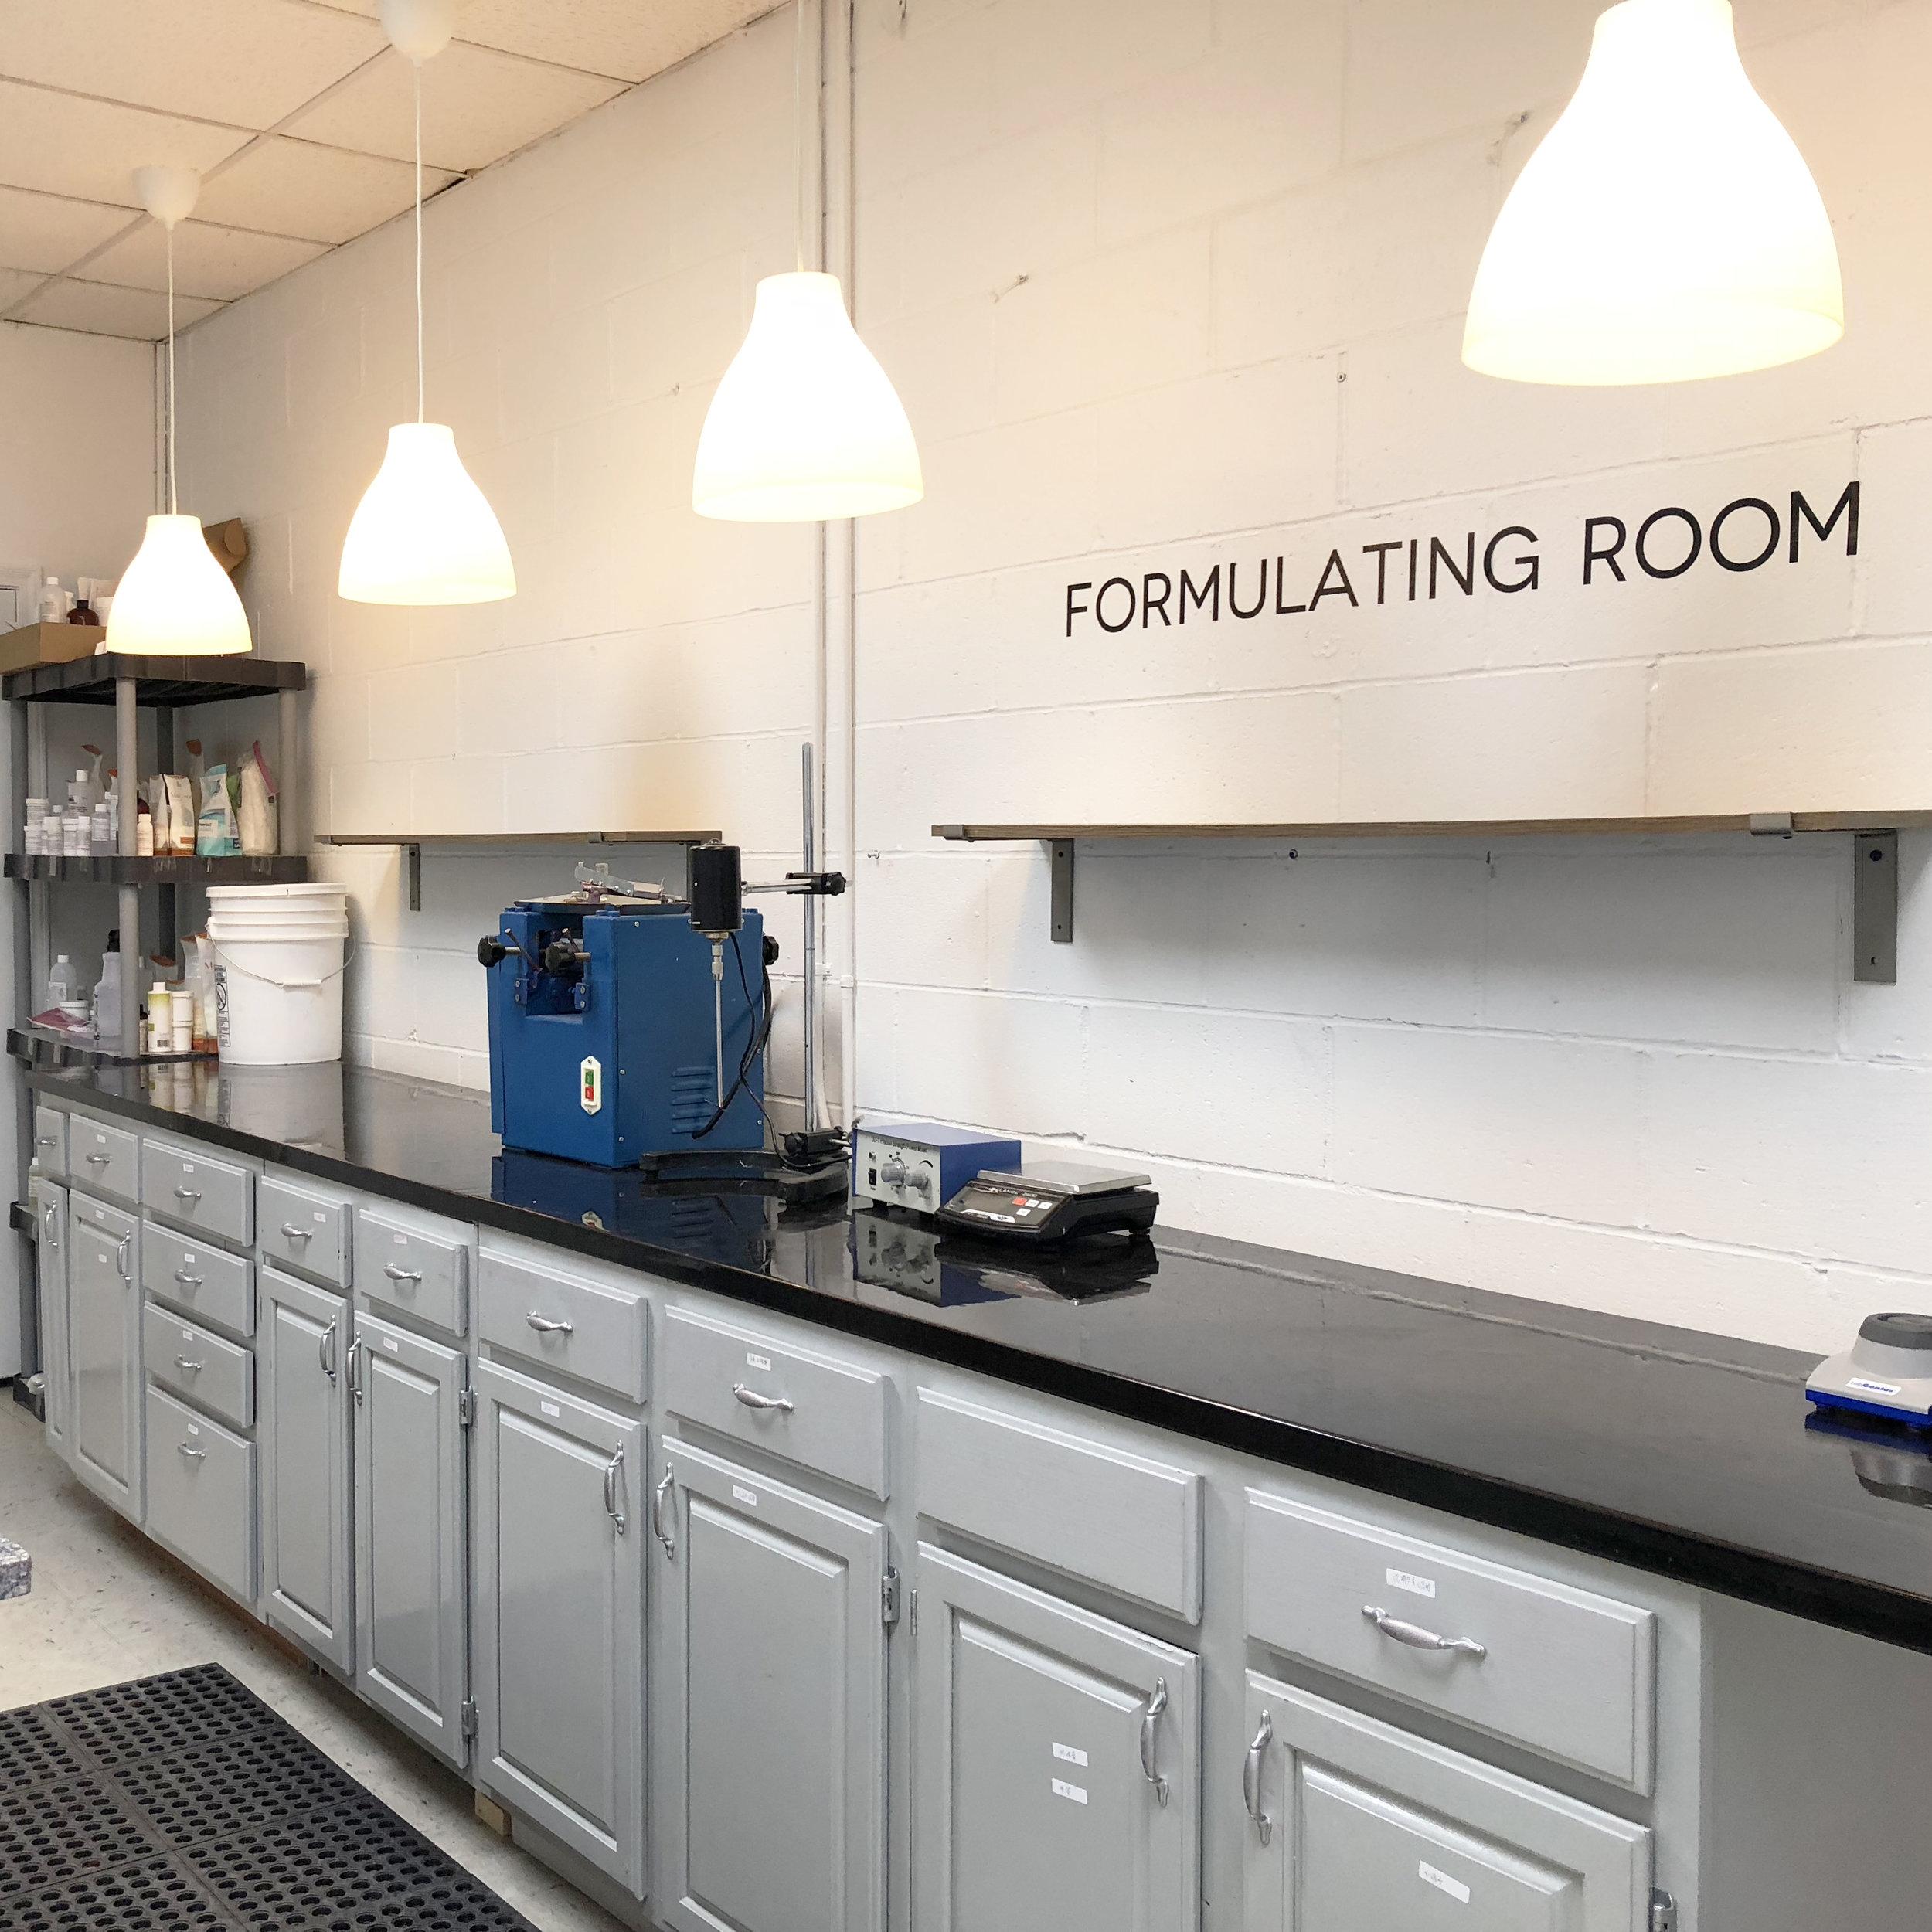 Formulating Room 1x1.jpg